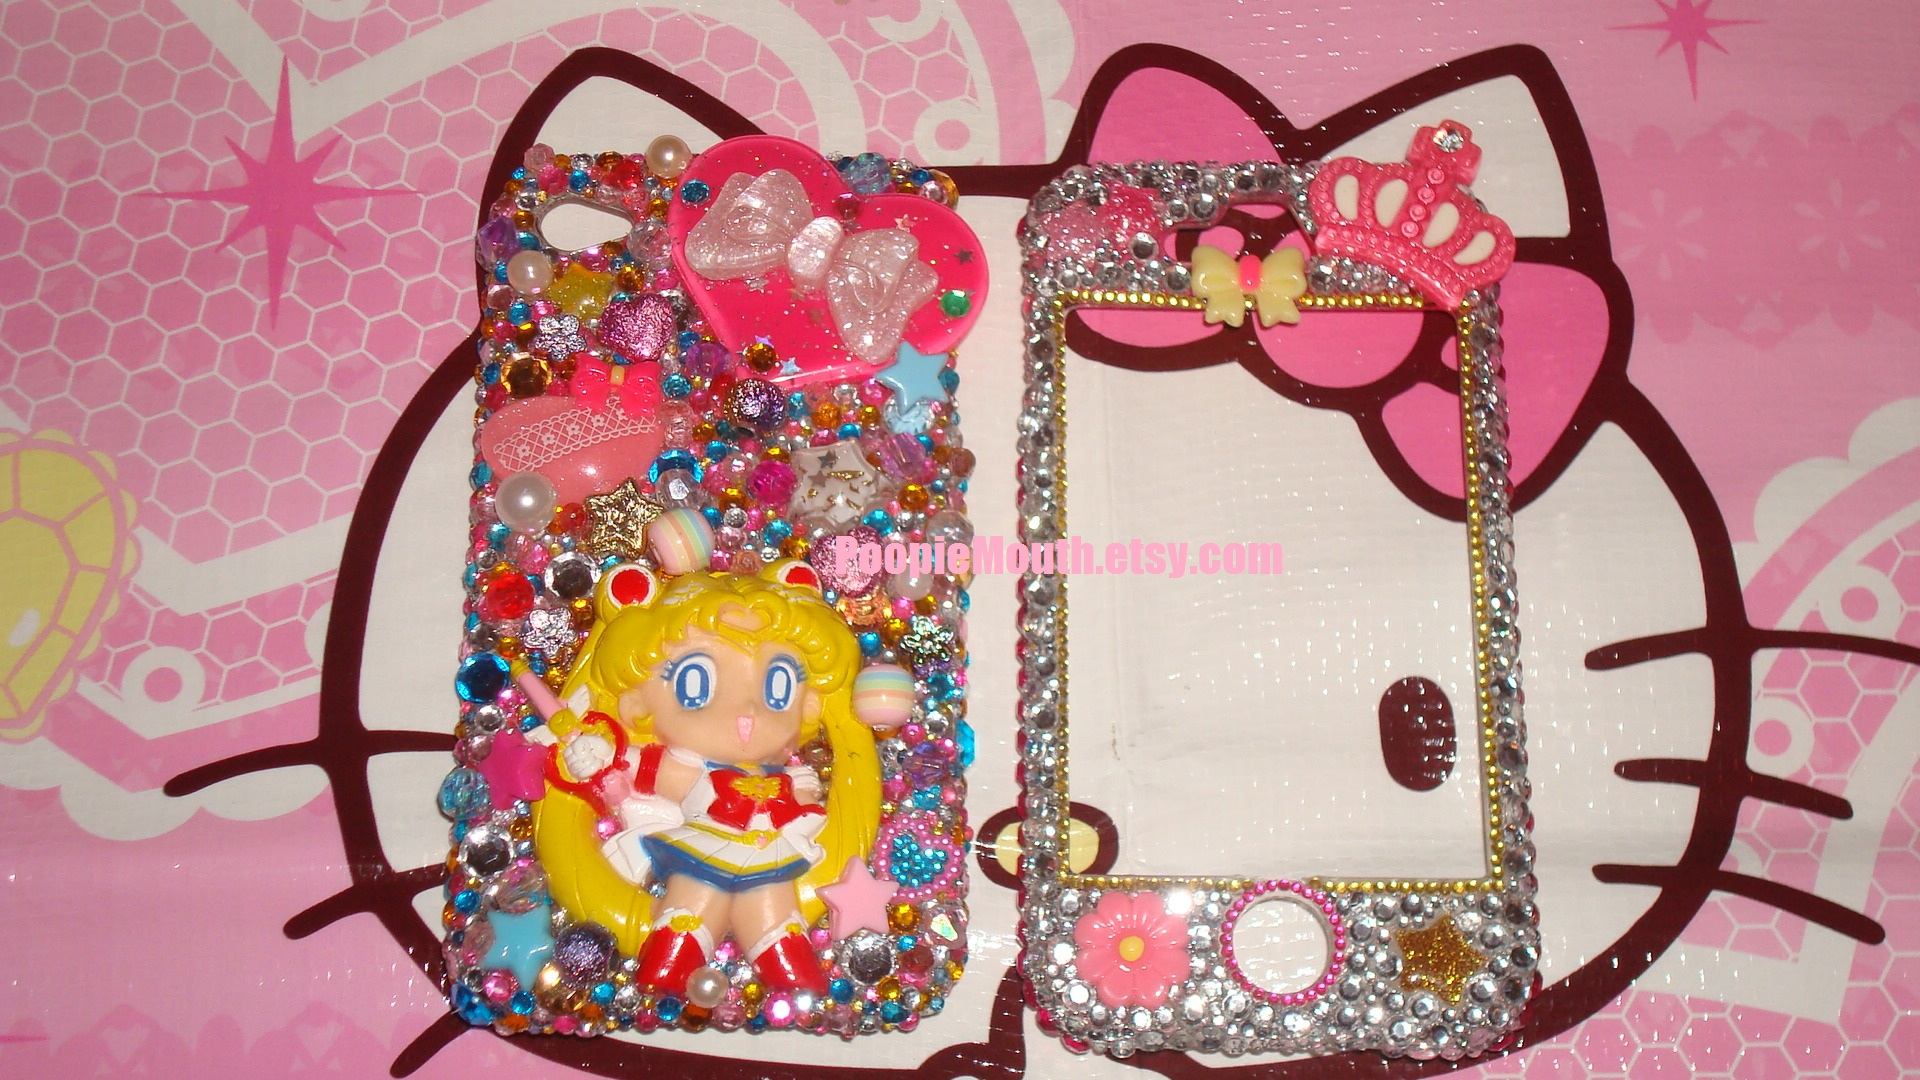 Super Sailor Moon iPhone 4G Cell Phone Case by BD SandM on DeviantArt 4SM6PoUR